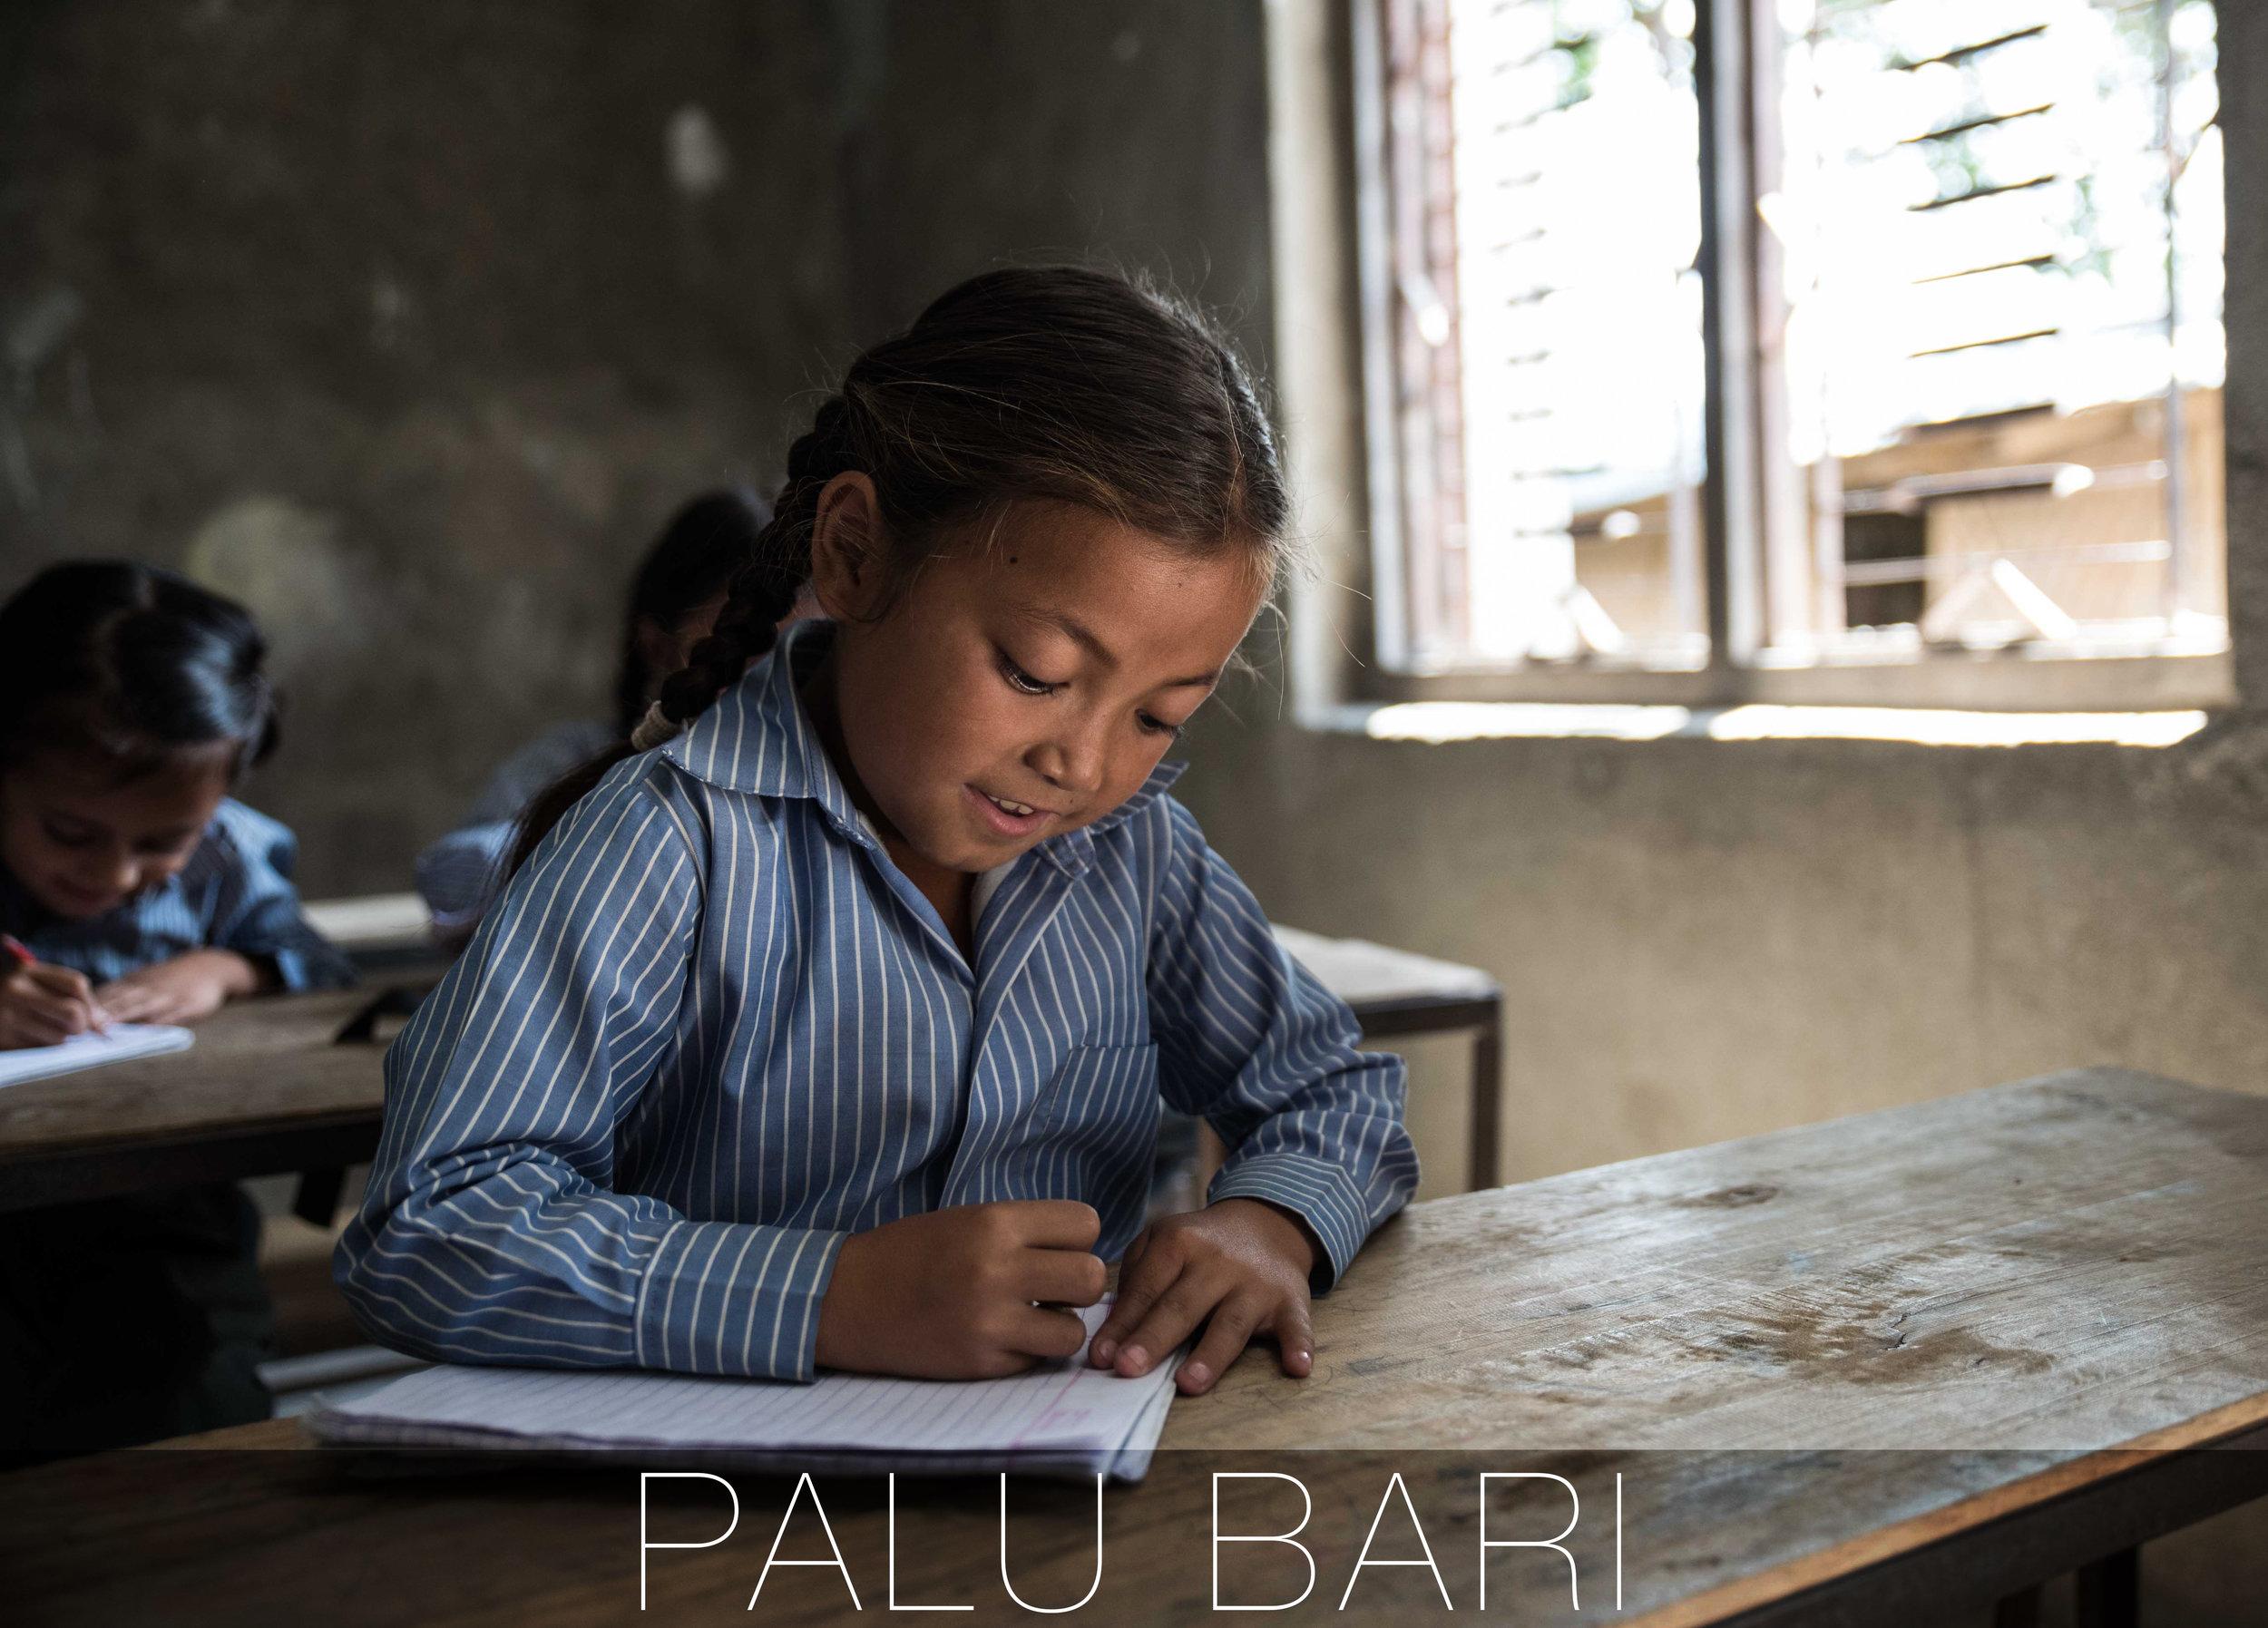 Palu Bari THISWORLDEXISTS education volunteer Nepal